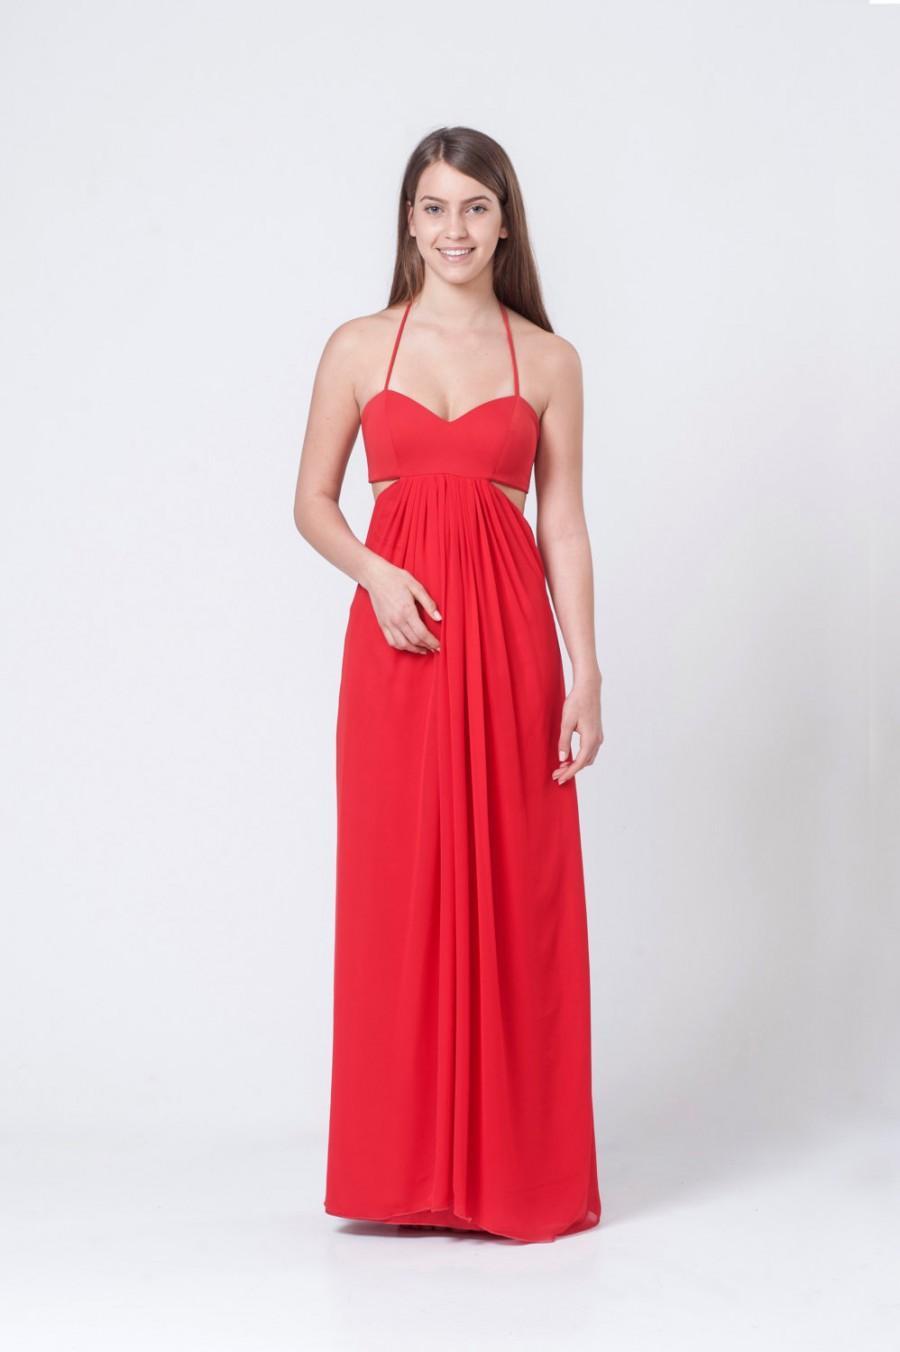 Mariage - Red maxi side slits dress - Red spaghetti maxi dress - Red bridesmaids dress